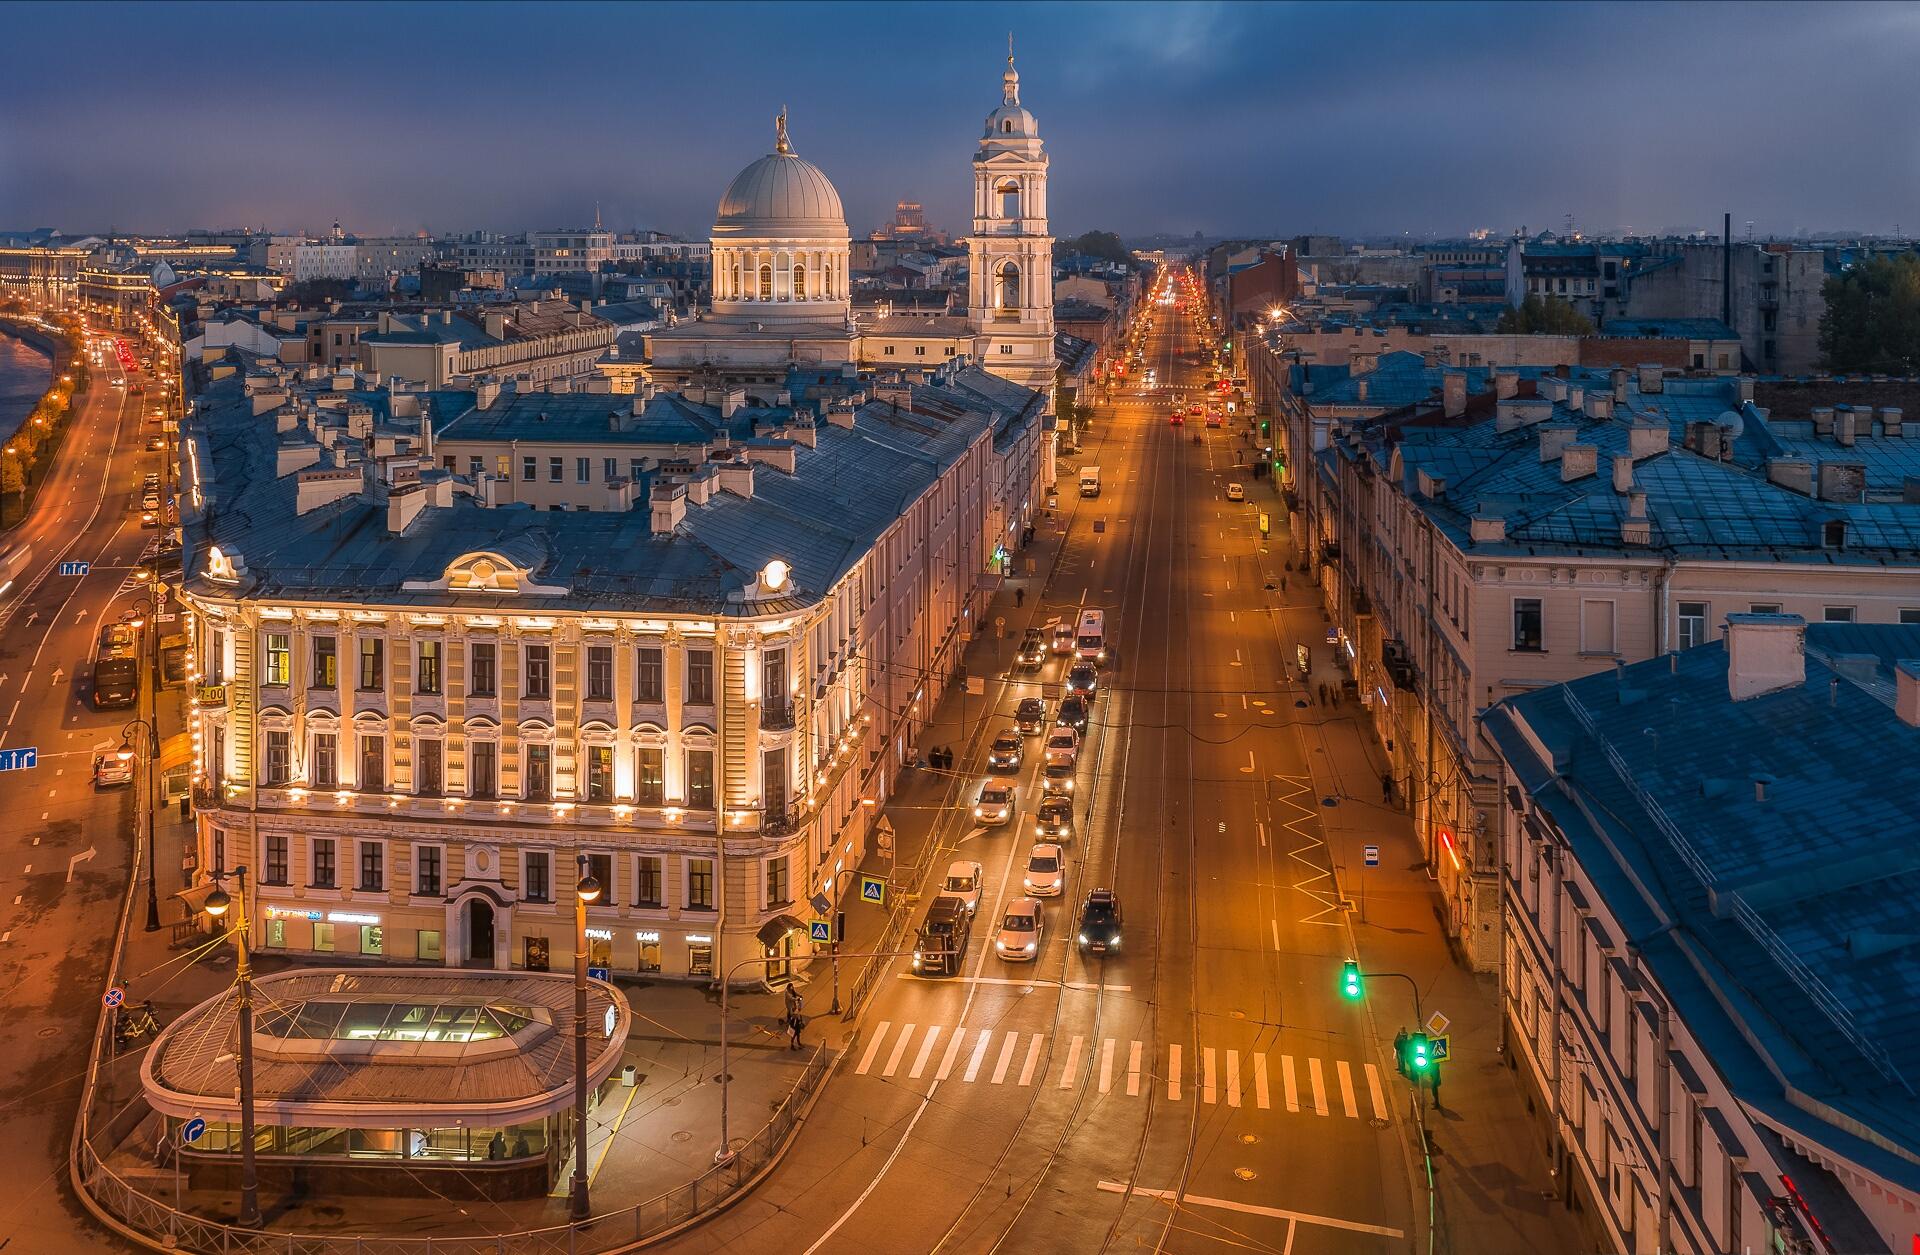 Building City Evening House Road Saint Petersburg 1920x1255